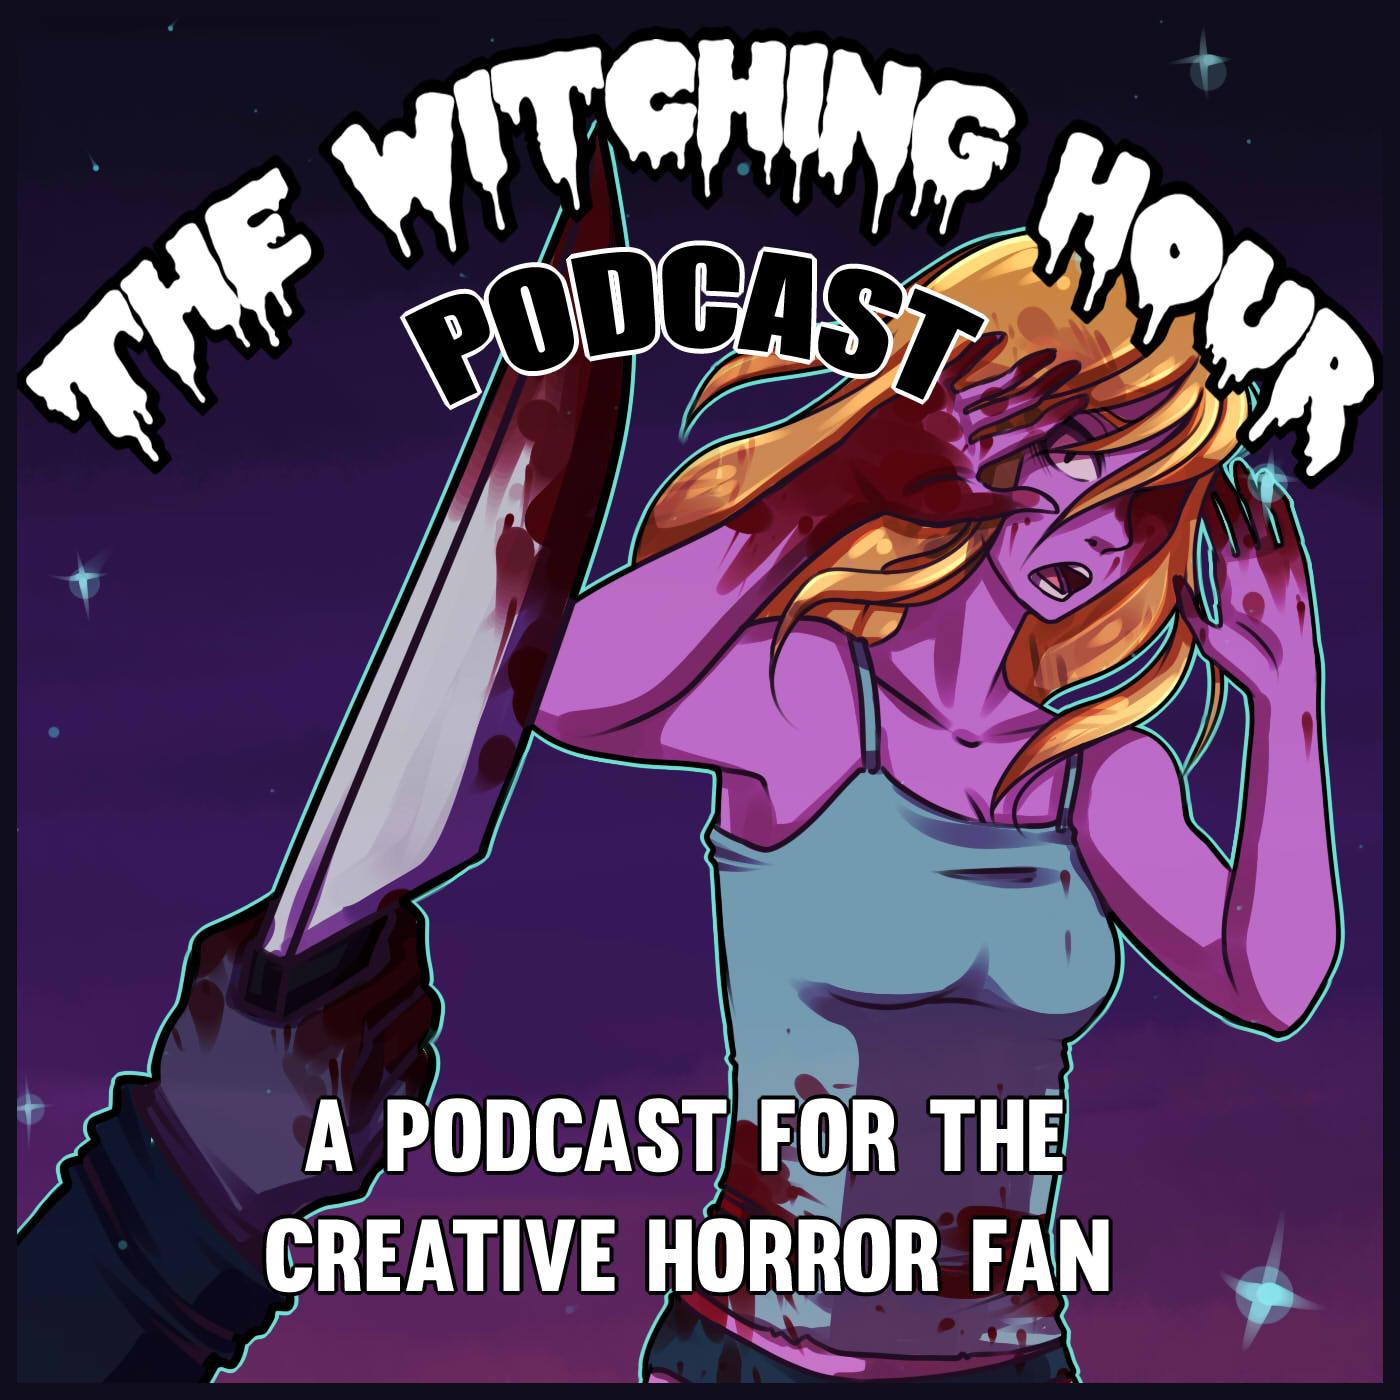 witchinghourpodcast_creativehorror08